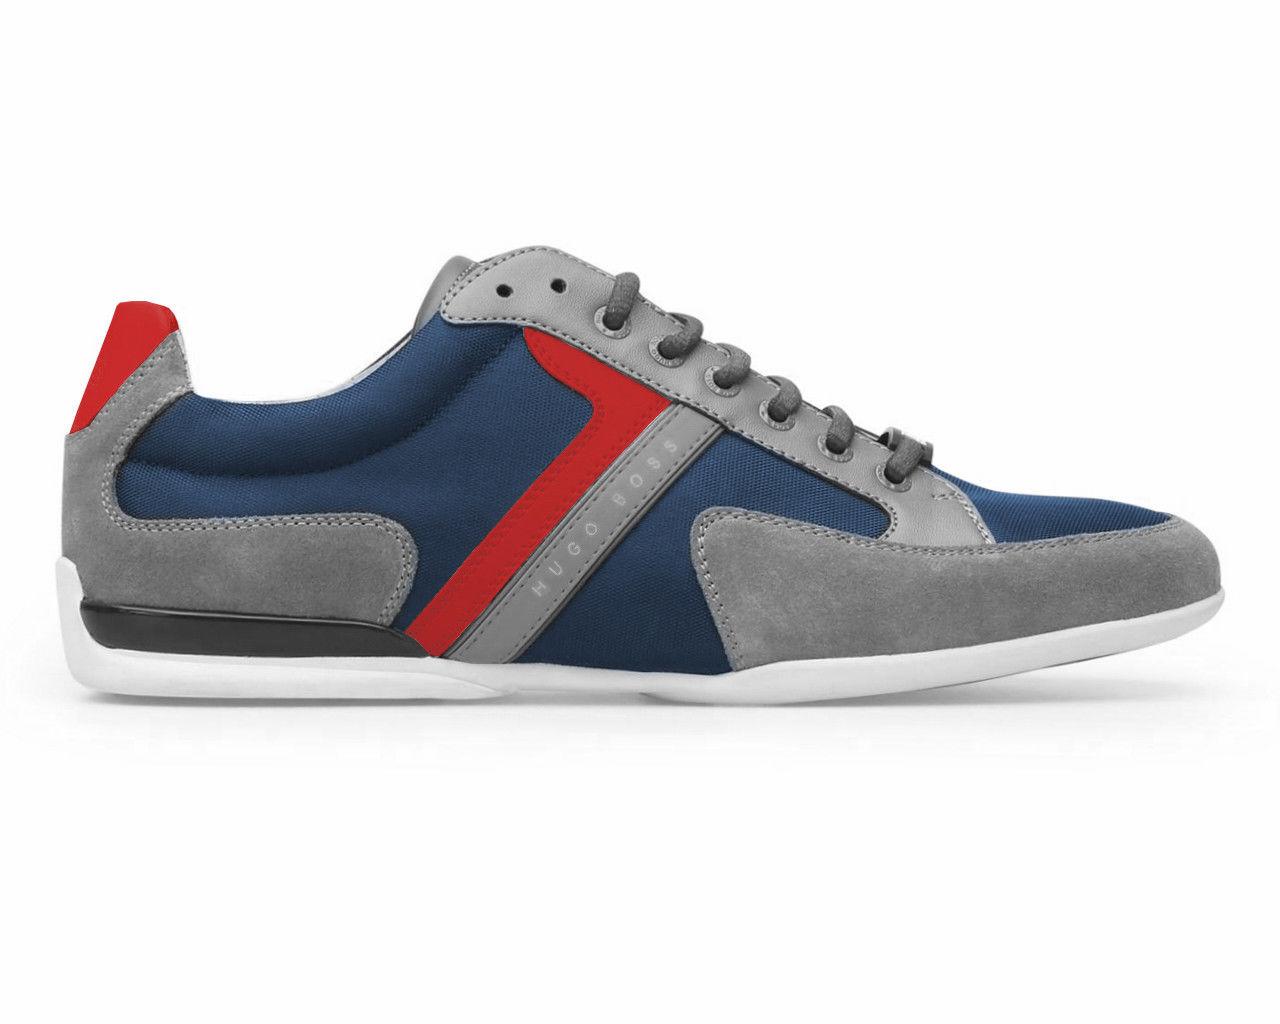 new concept 95756 500d4 ... Hugo Boss Green Men s Premium Sport Fashion Fashion Fashion Sneakers  Running Shoes Spacit 3df3e2. Skip to content